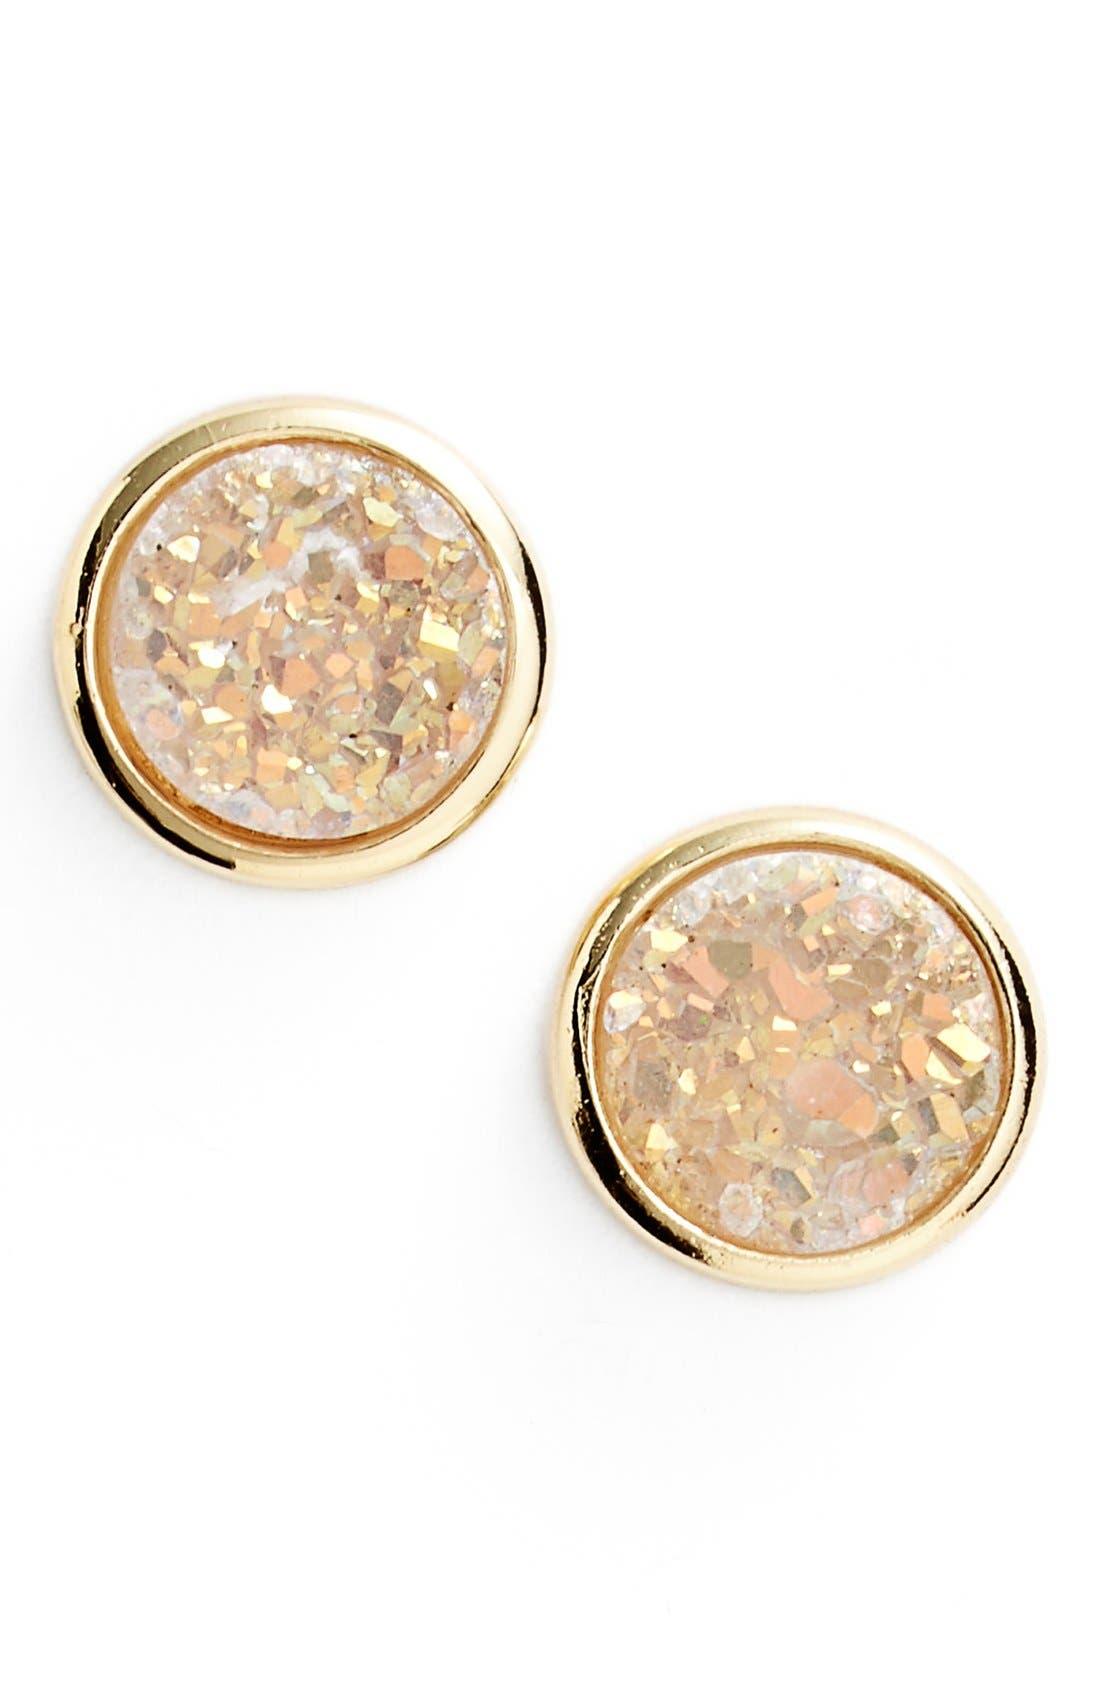 Alternate Image 1 Selected - Marcia Moran Mini Drusy Stud Earrings